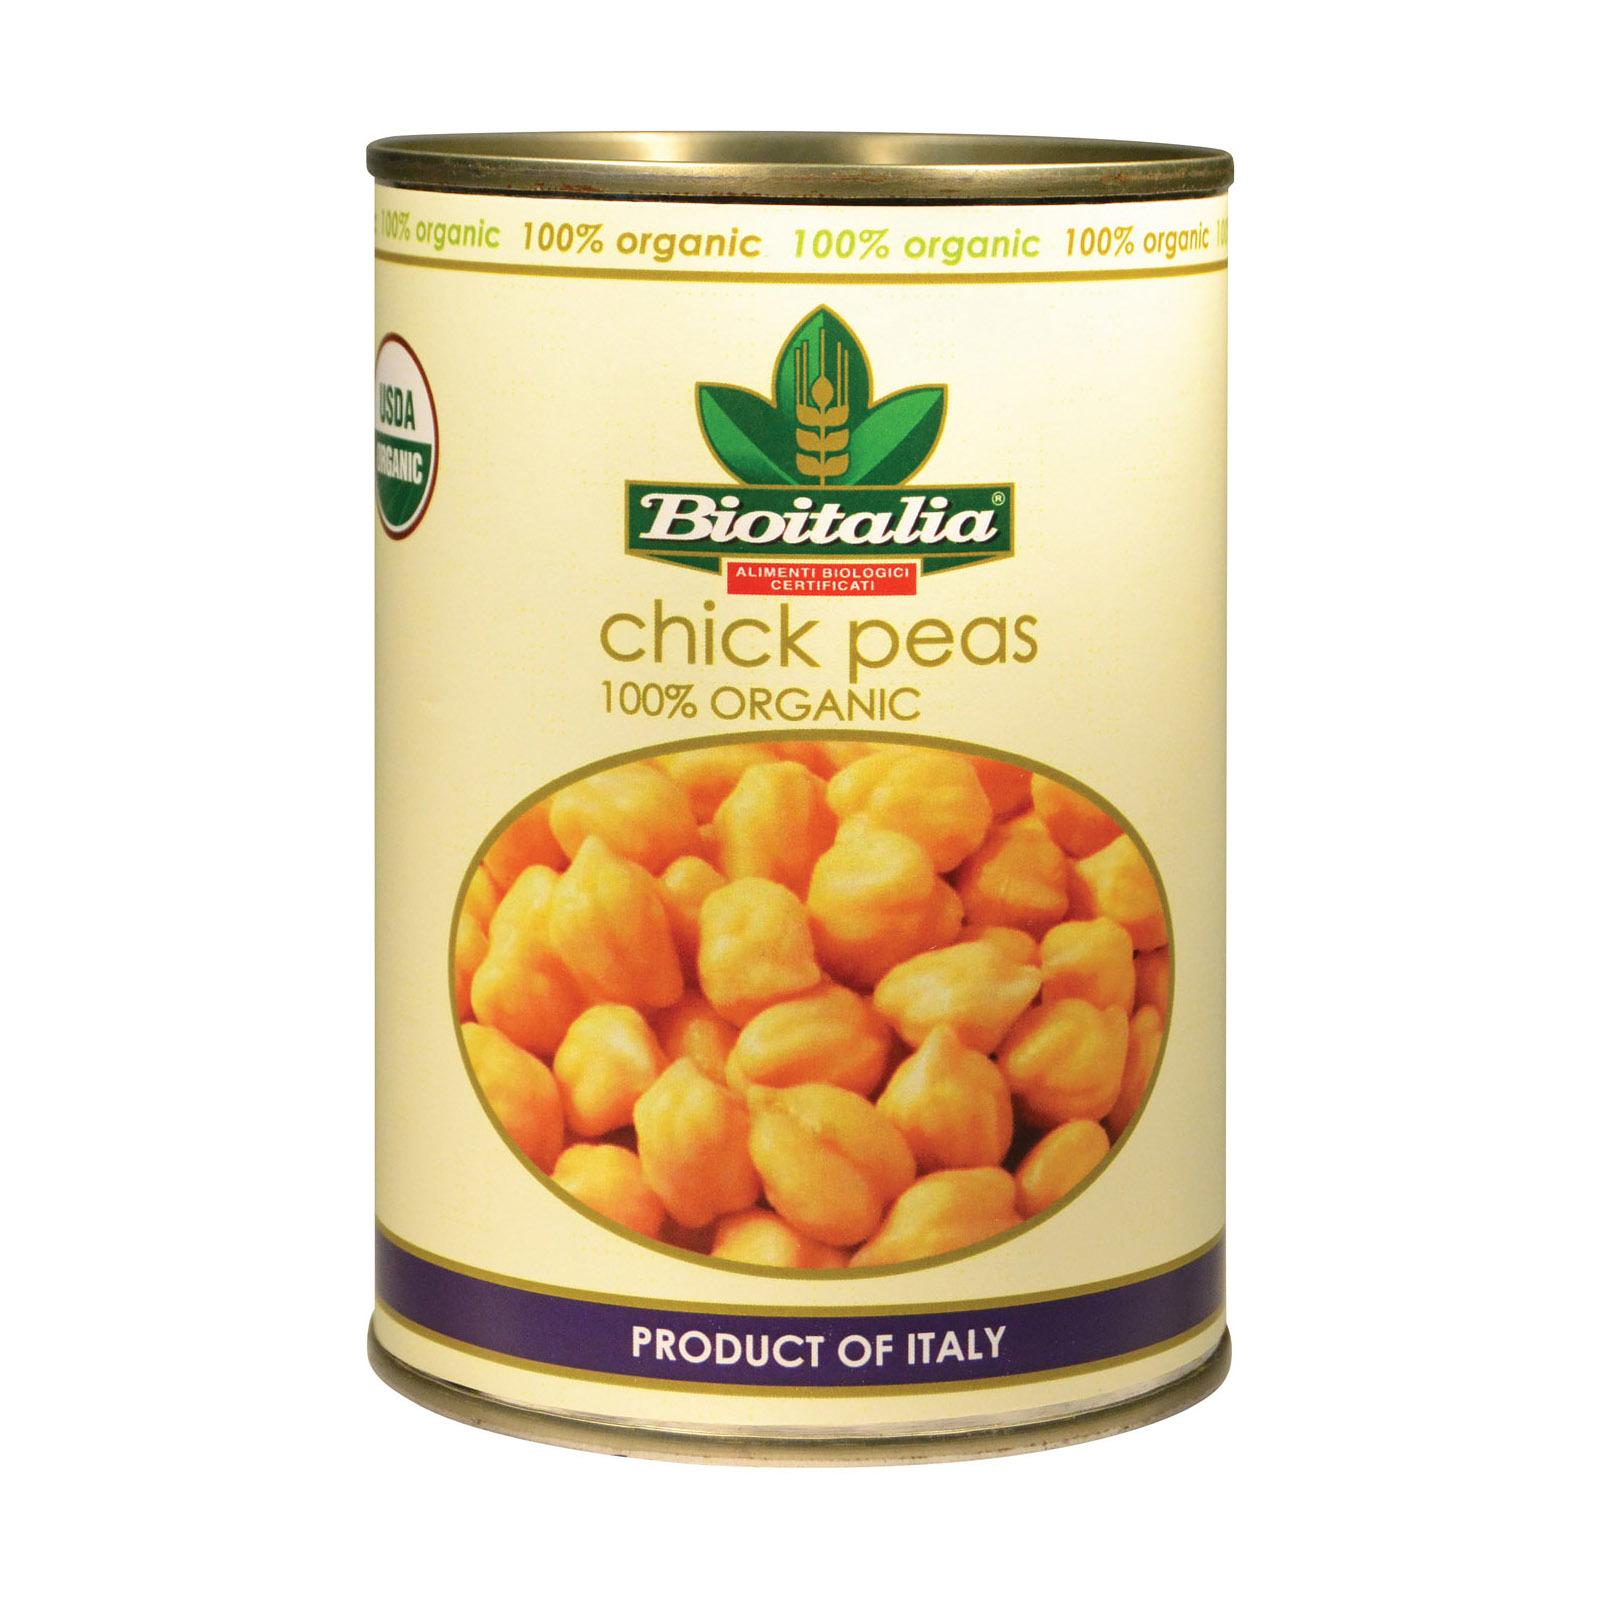 Bioitalia Organic Beans - Chick Peas - Case of 12 - 14 oz.